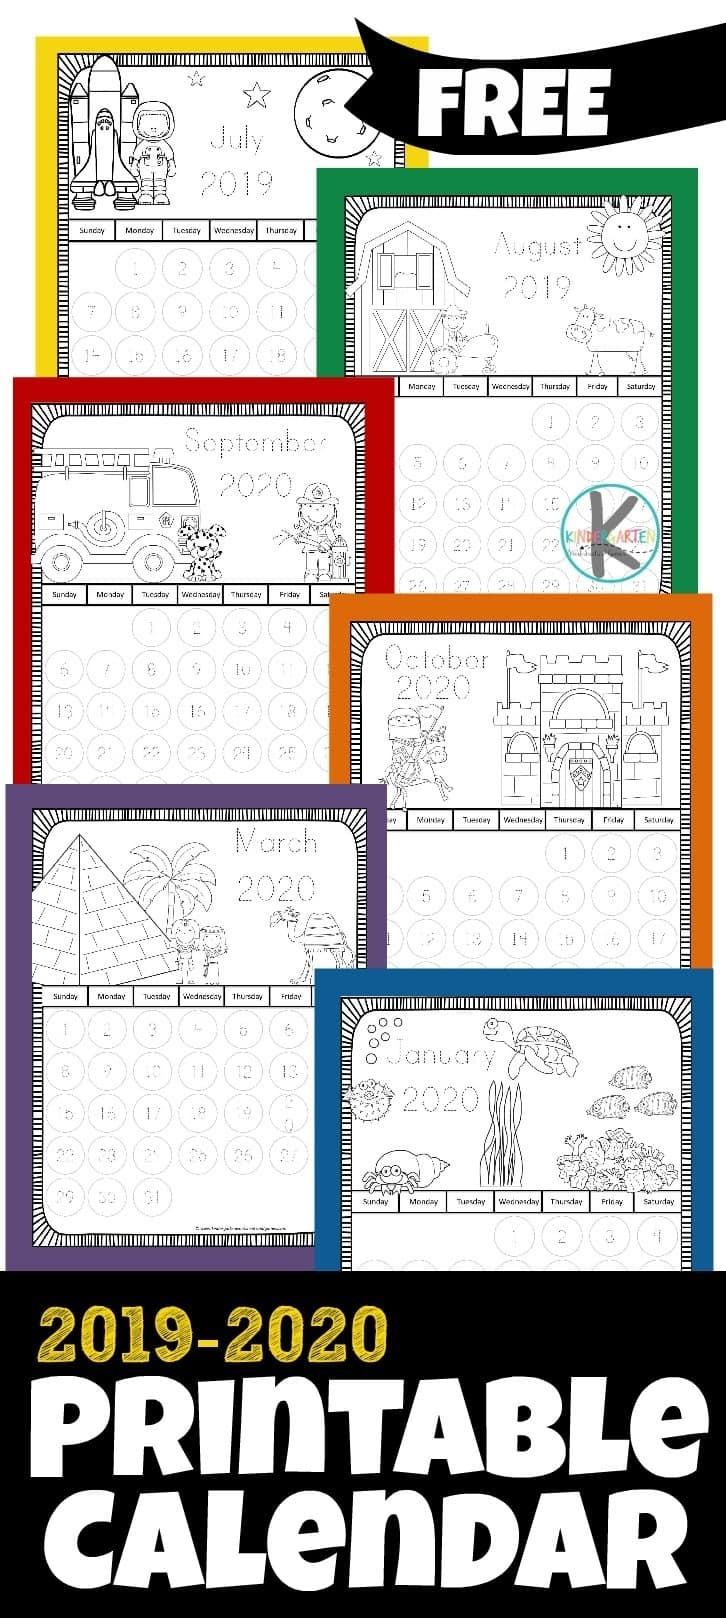 Free 2019-2020 Printable Calendar To Color – Kindergarten Worksheets in Free Printable Calendars For Kindergarten 2019-2020